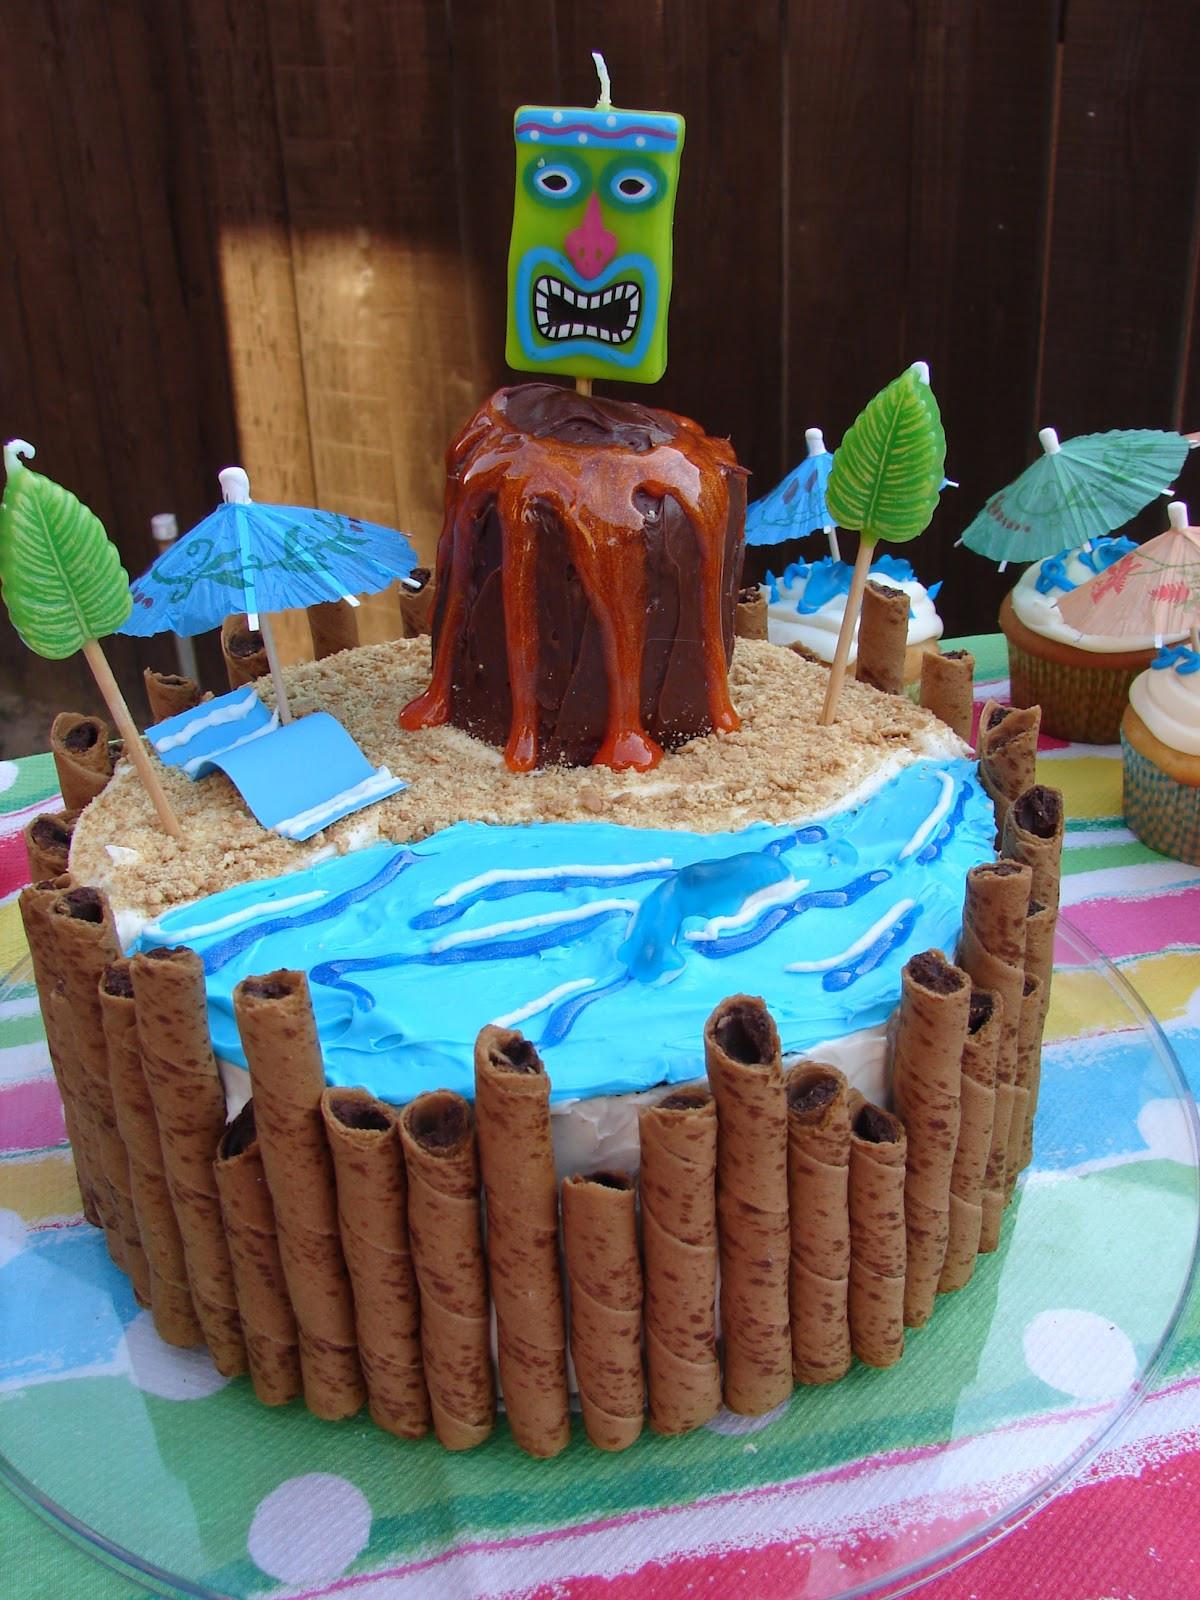 Best ideas about DIY Birthday Cakes . Save or Pin Glitter Glue GLAM DIY Luau Birthday Cake Now.